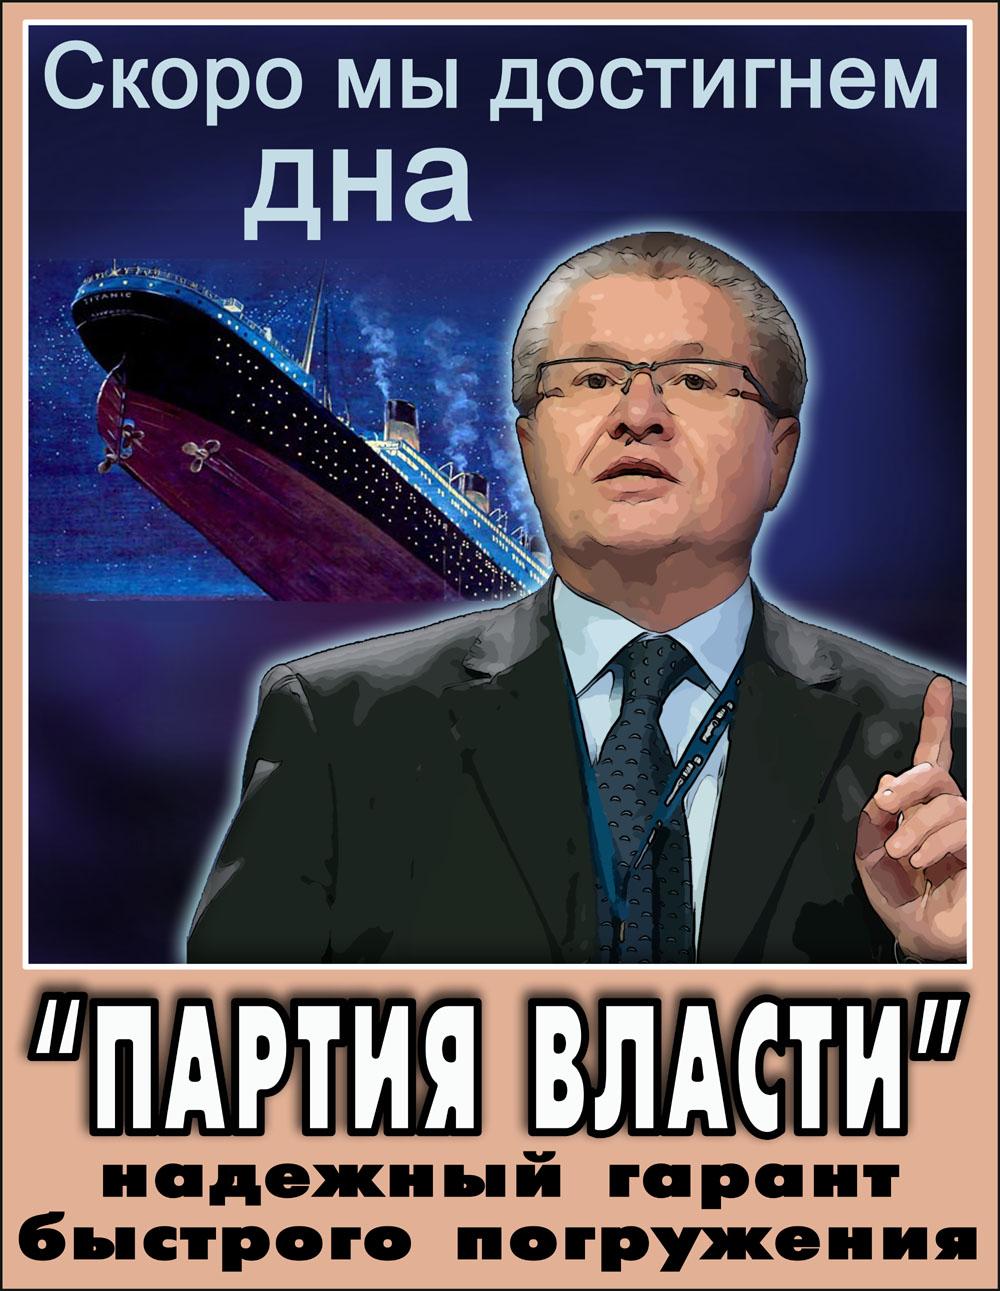 https://img-fotki.yandex.ru/get/43800/6566915.c/0_13779b_f59a9cb2_orig